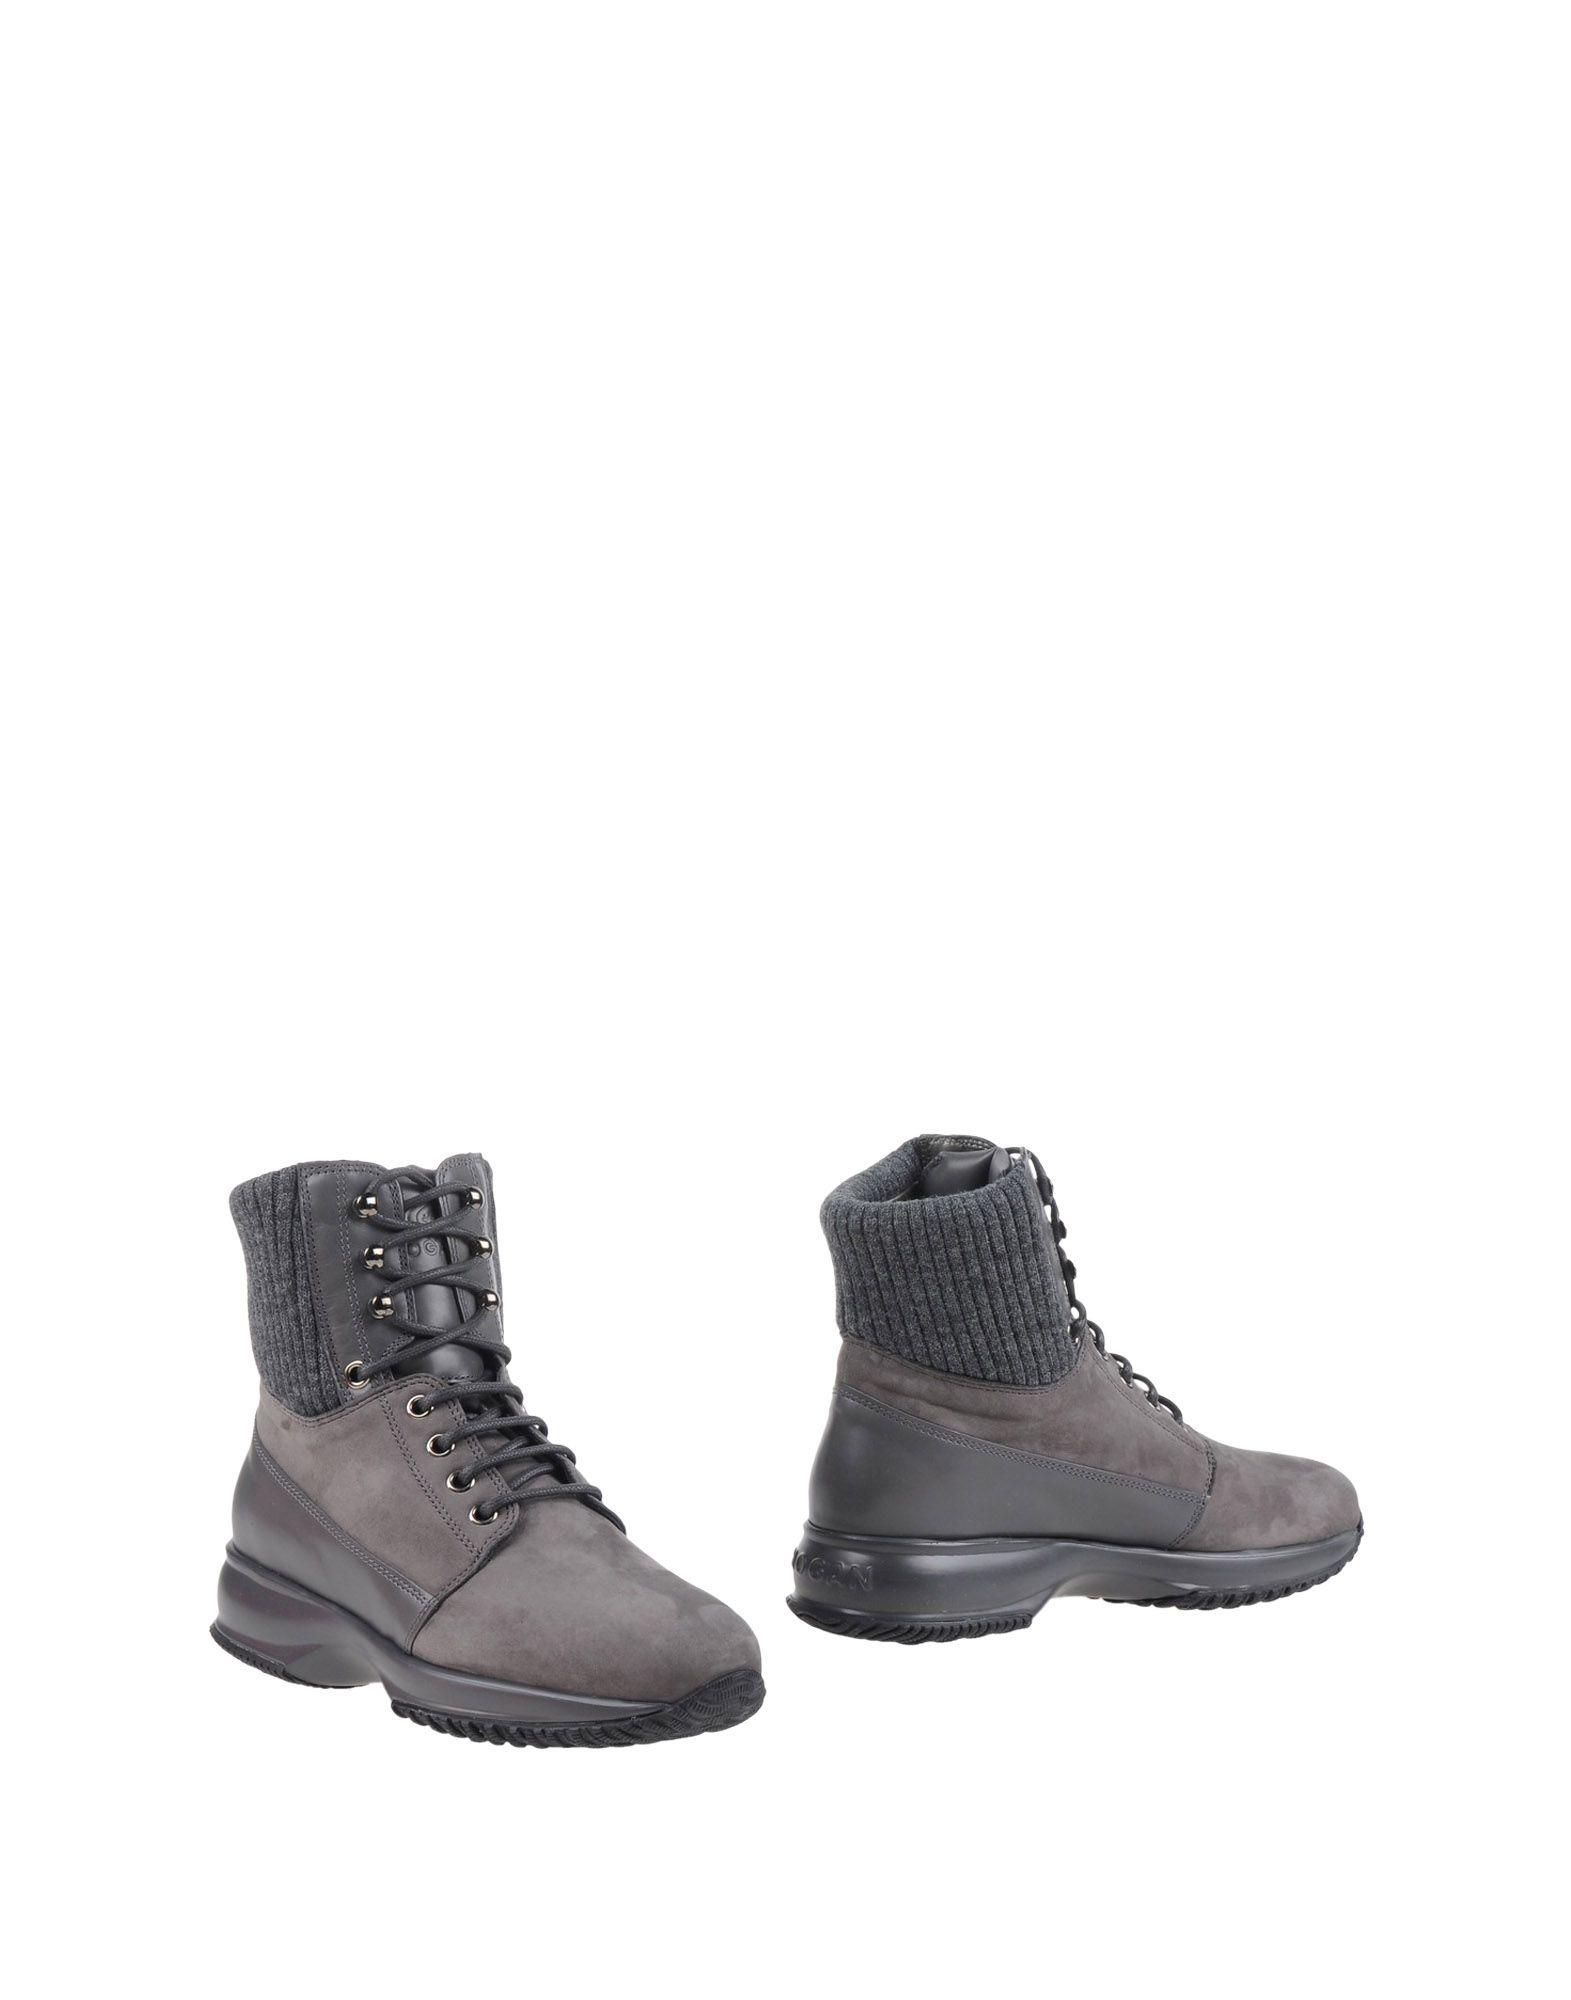 Haltbare Mode billige Schuhe Damen Hogan Stiefelette Damen Schuhe  11024565AJ Heiße Schuhe cc781f